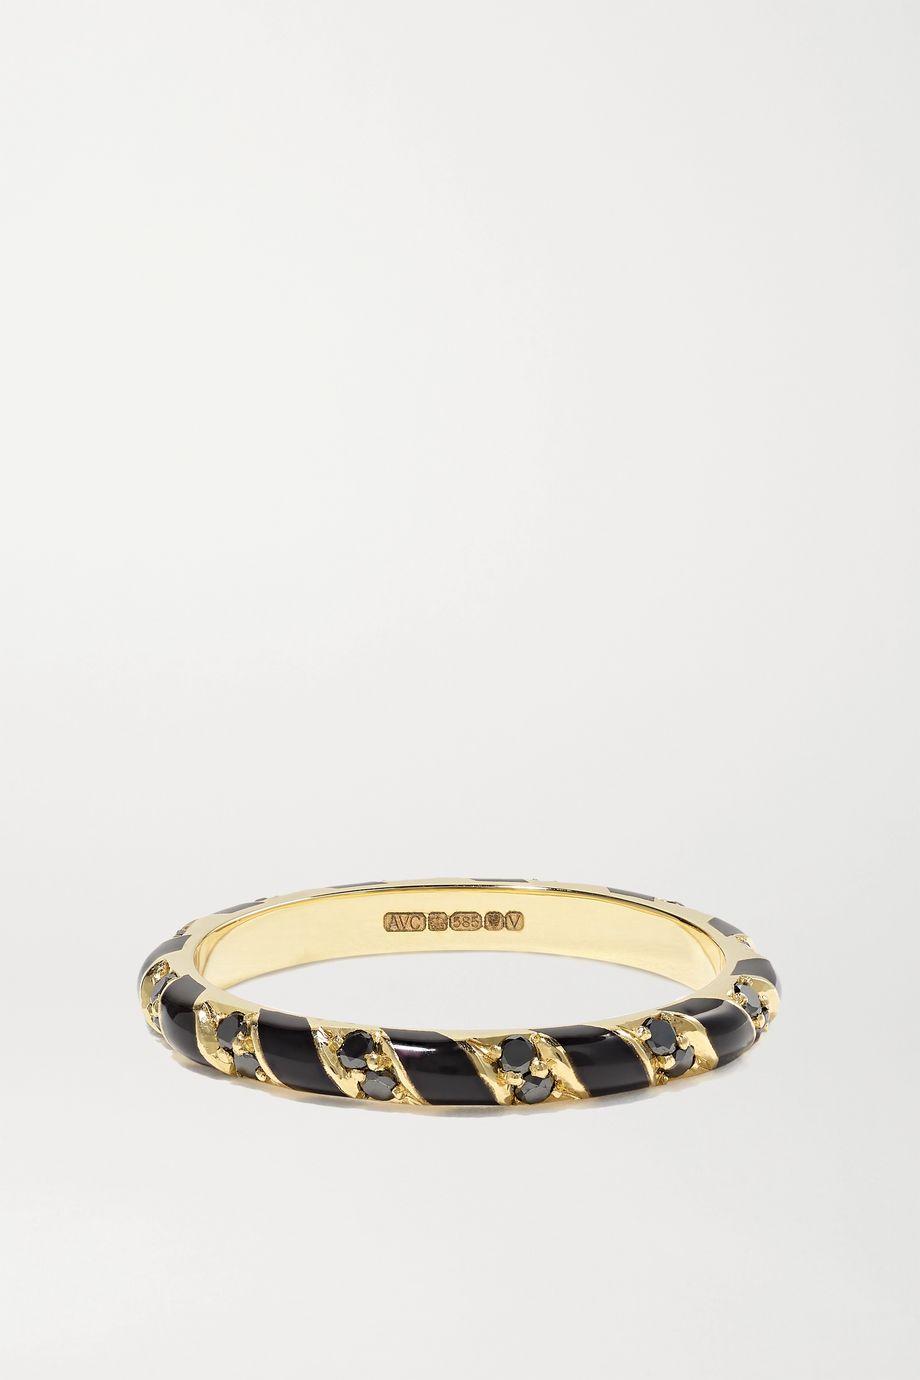 Alice Cicolini Memphis Candy 14-karat gold, enamel and diamond ring